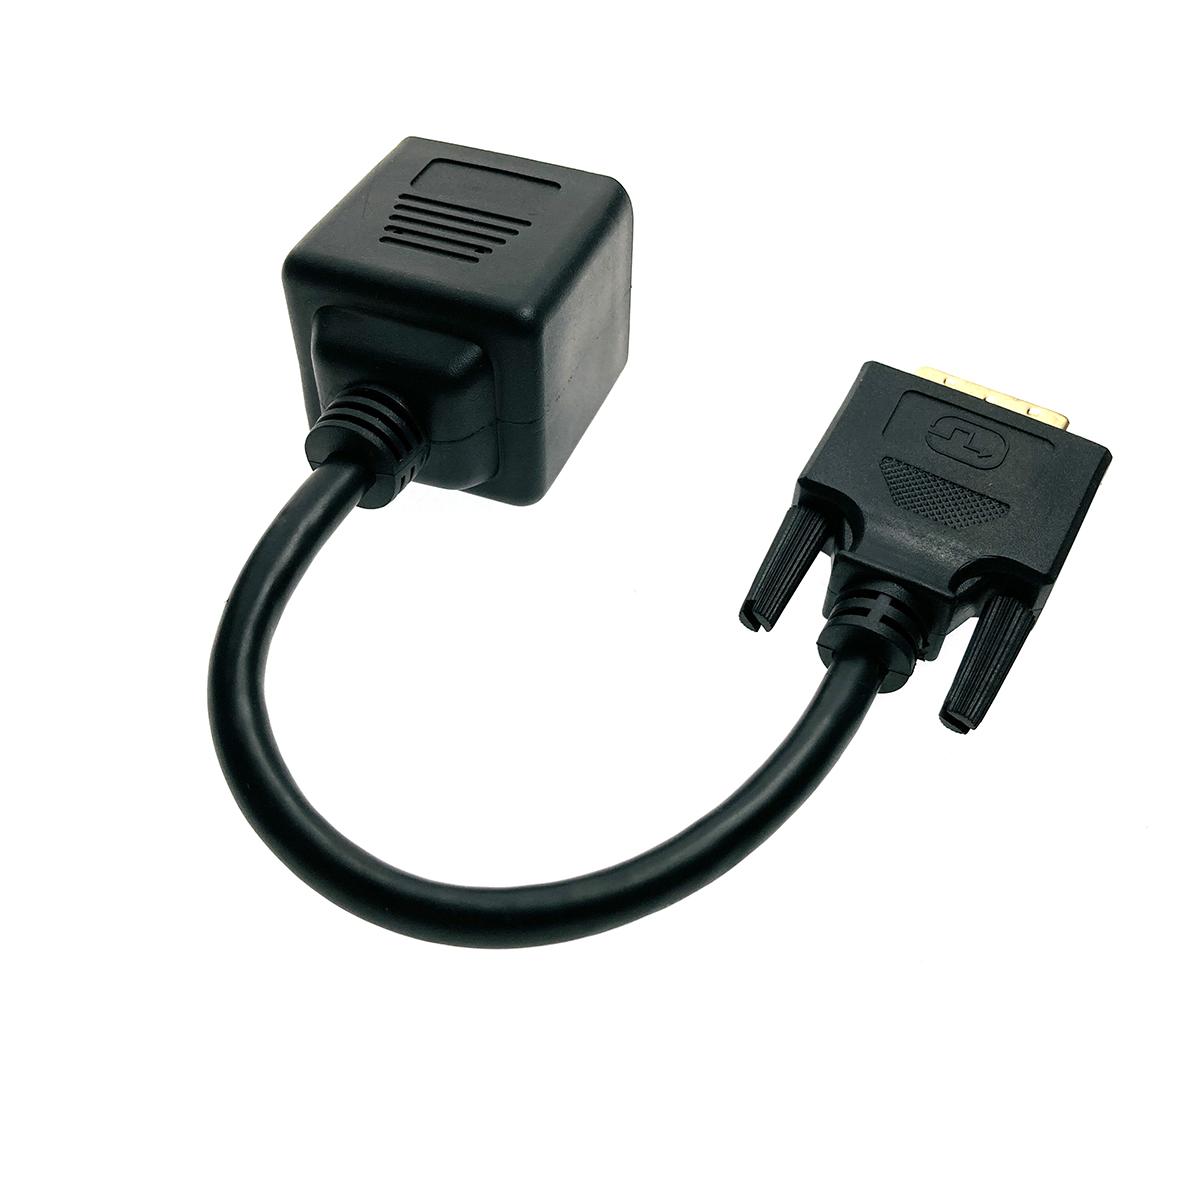 Разветвитель DVI-D 25 pin male to 2*HDMI 19 pin female, Espada EDVIM2xHDMIF25